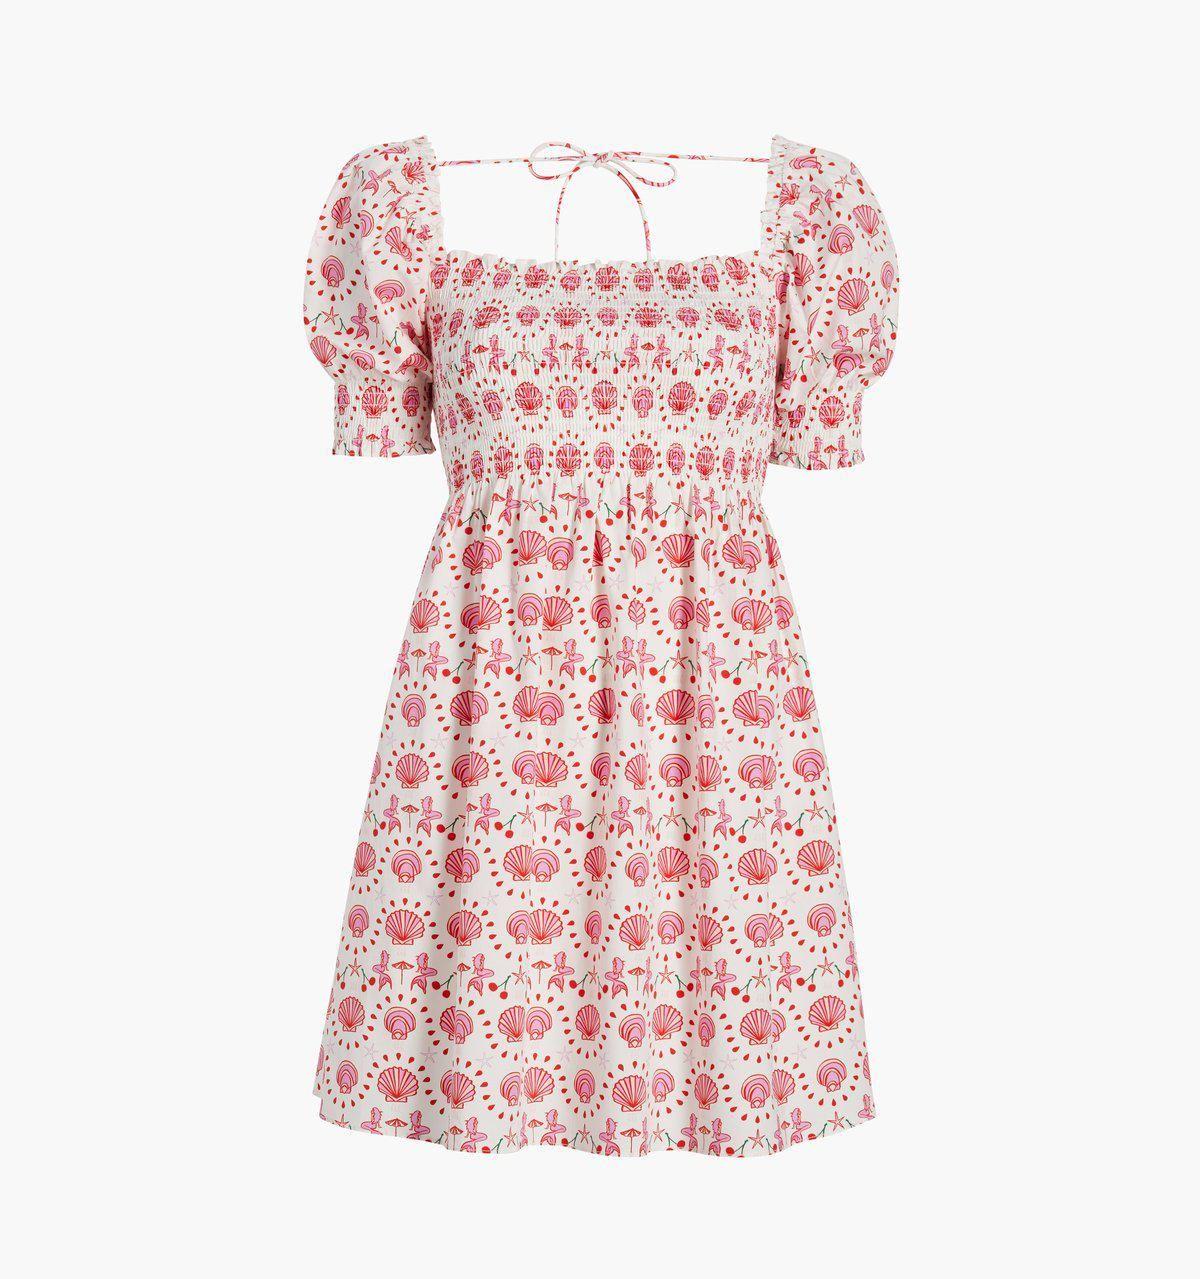 The Athena Nap Dress